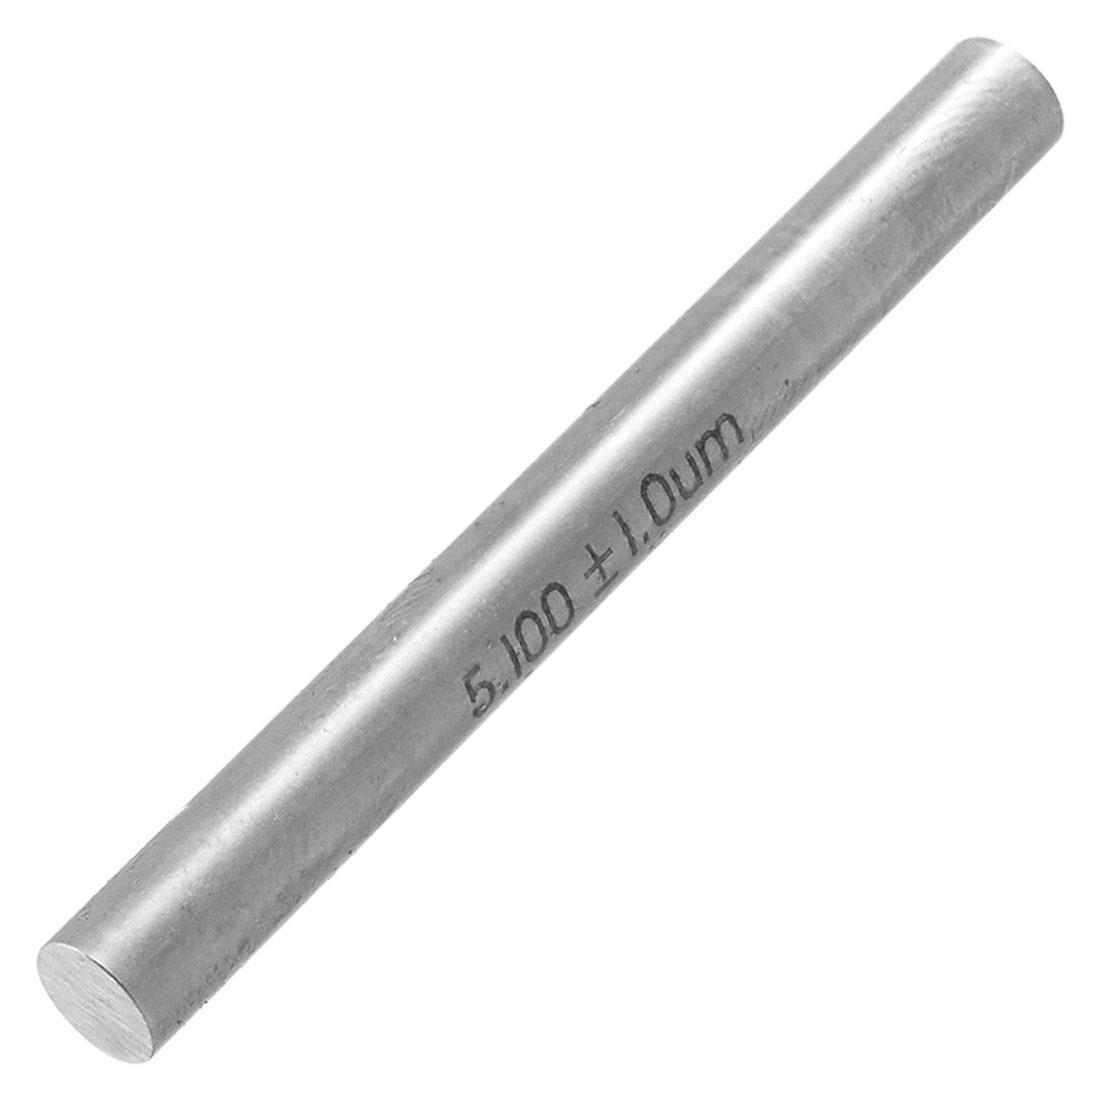 Industry 5.1mm Diameter 50mm Long Pin Gage Gauge w Clear Box